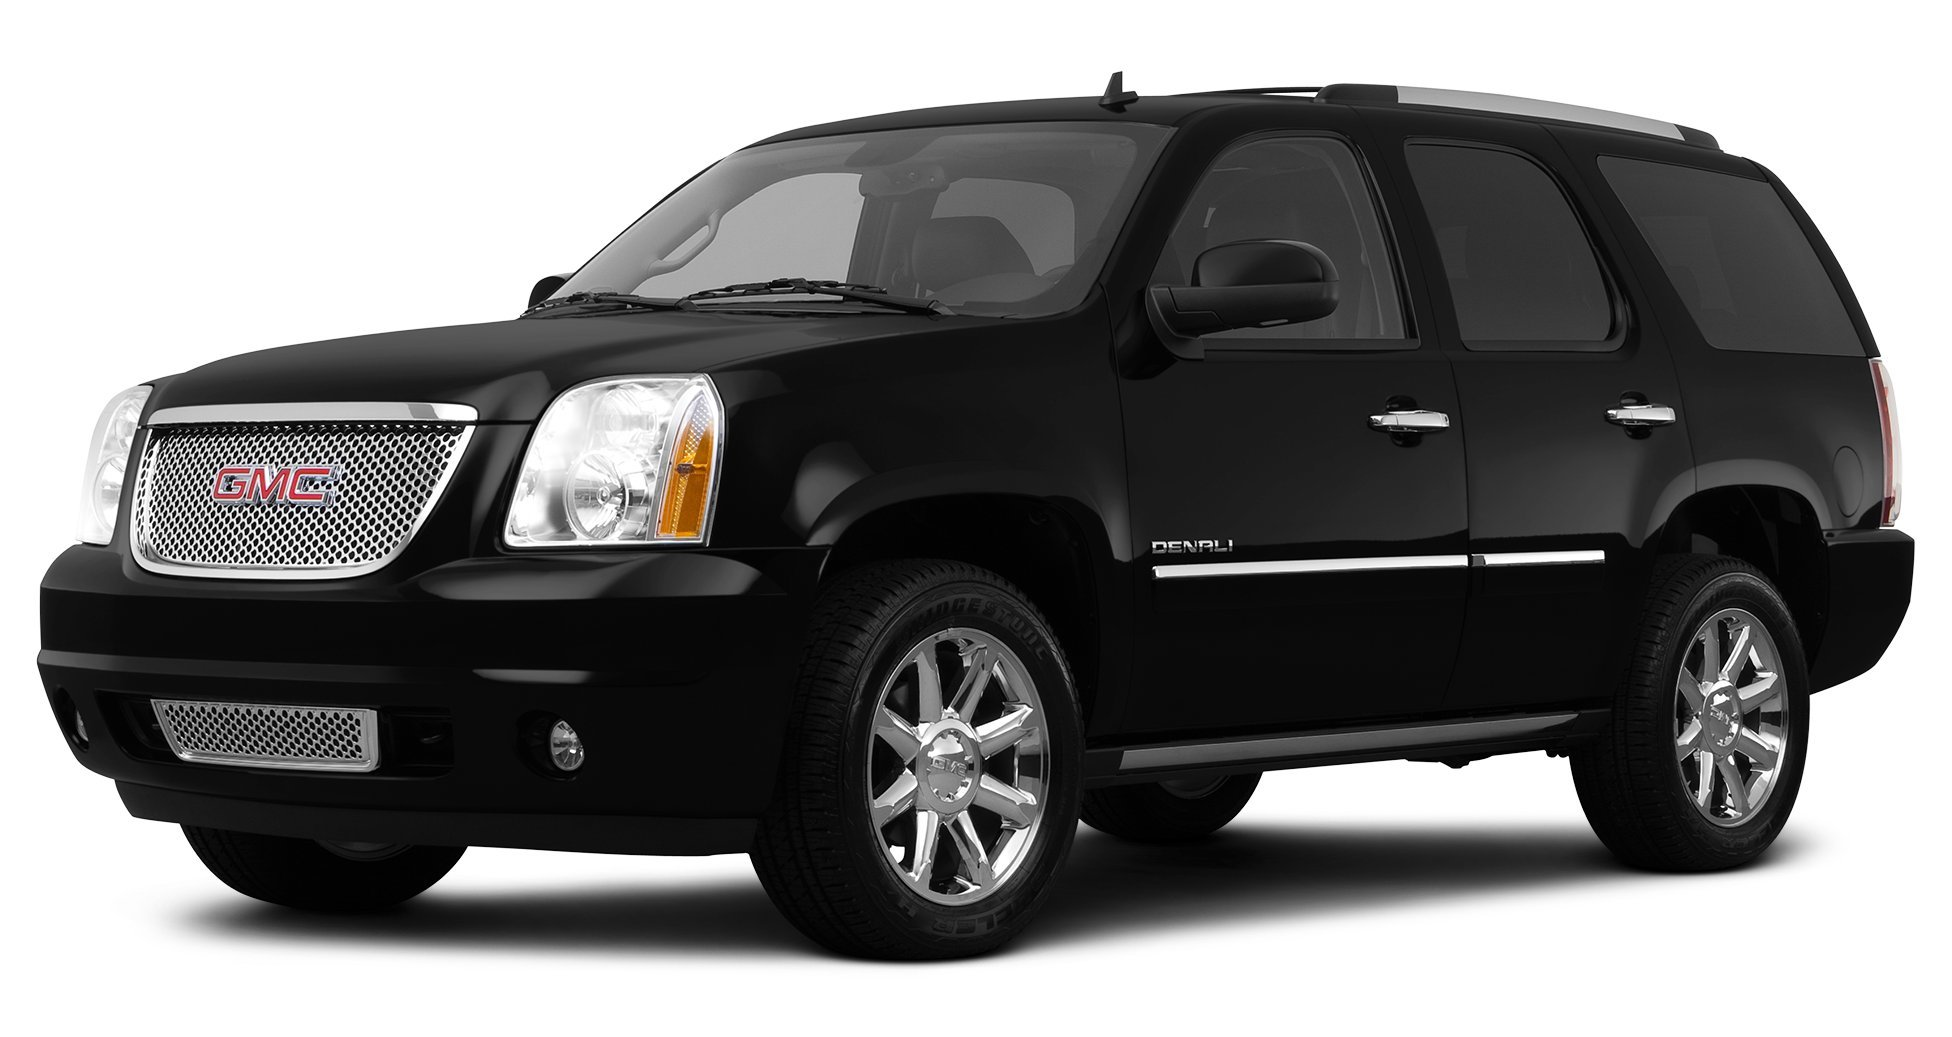 ... 2012 GMC Yukon Denali, 2-Wheel Drive 4-Door 1500